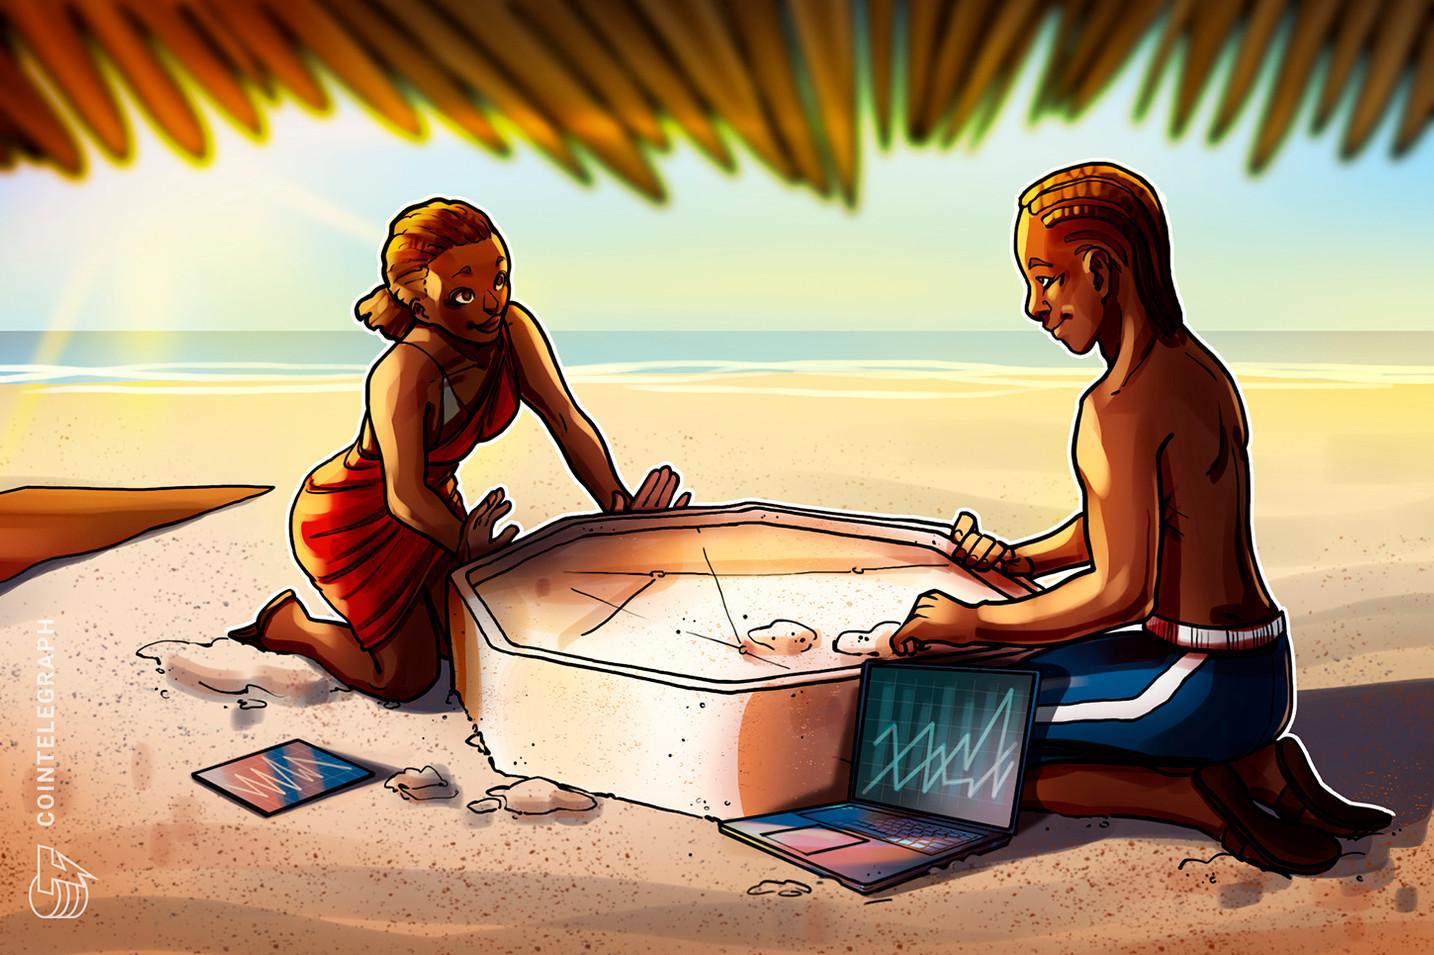 Ghana's digital cedi must emulate cryptocurrencies, Afroblocks states